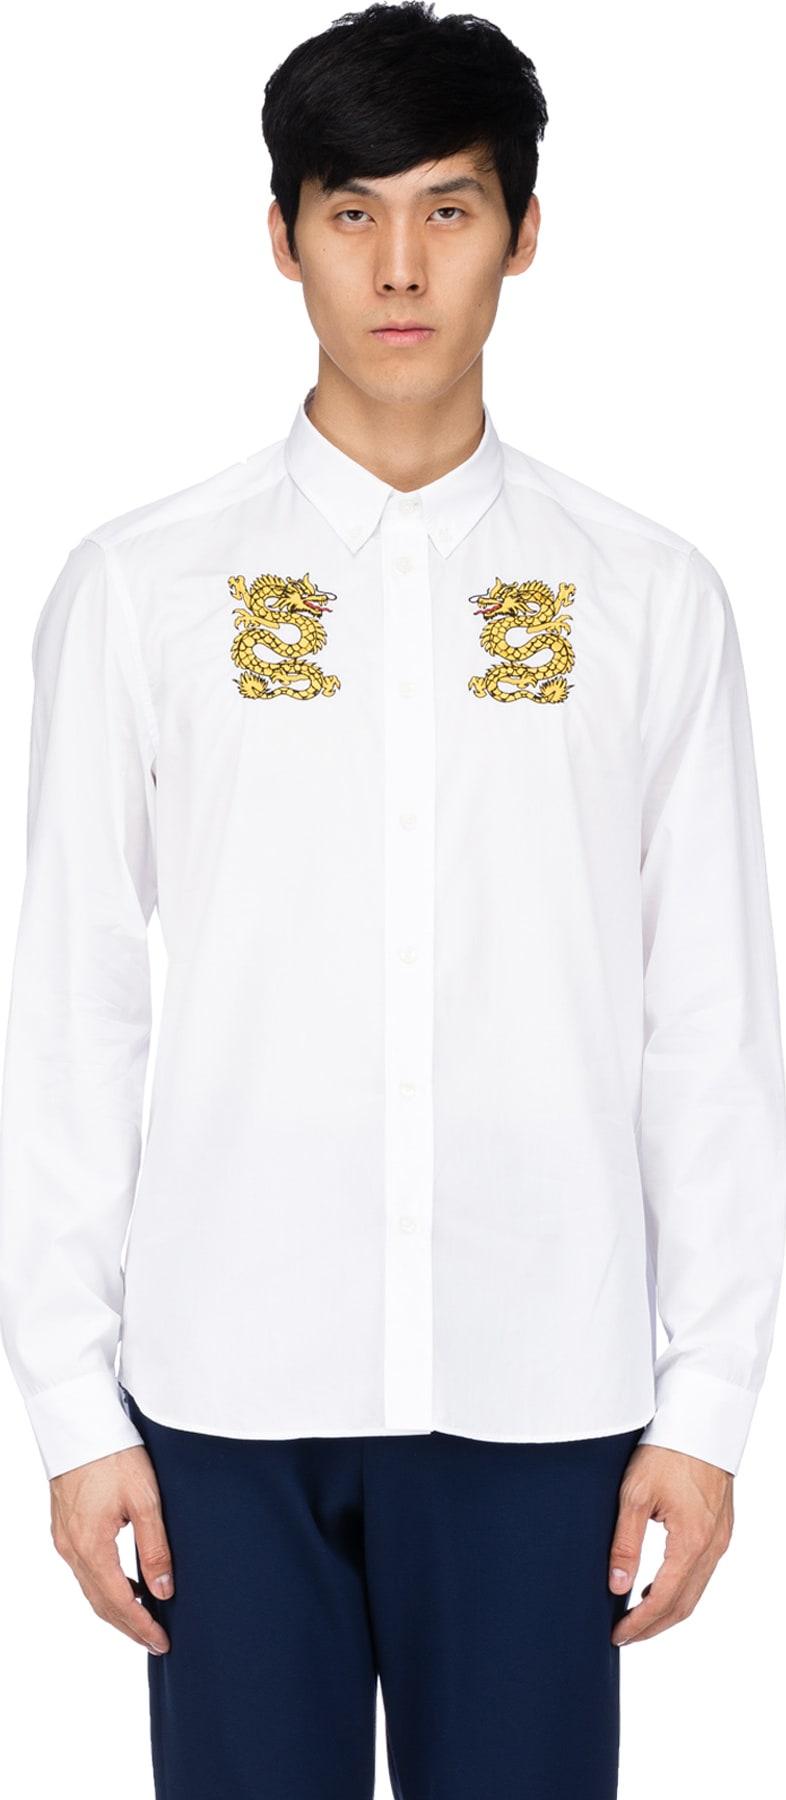 0b67104b Kenzo: Embroidered Dragon Shirt - White | influenceu